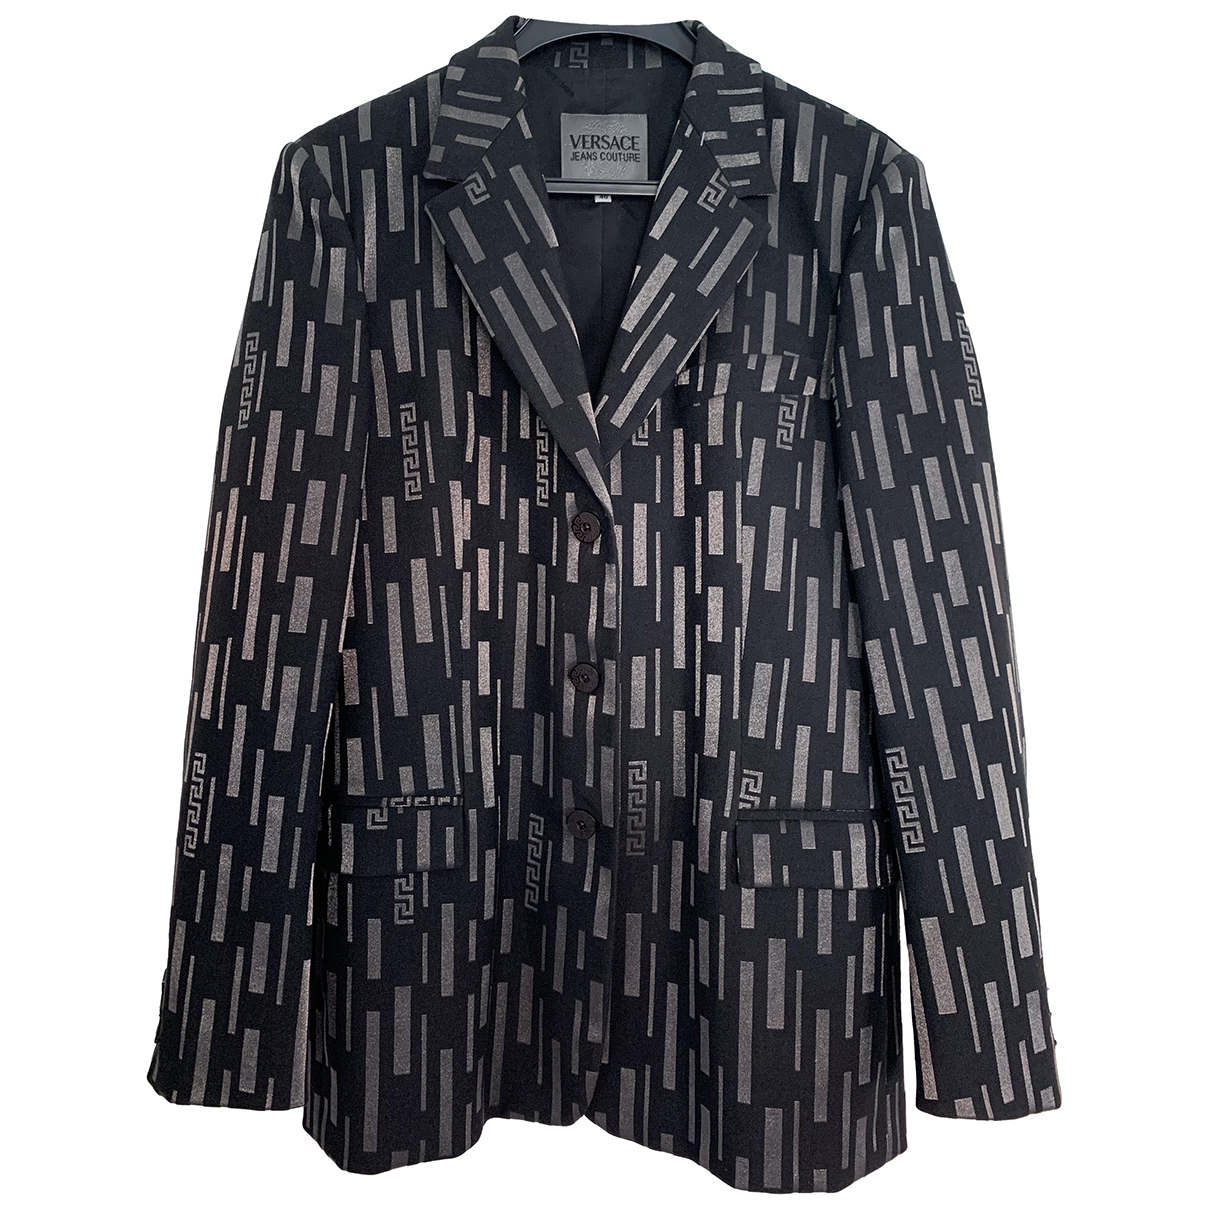 Versace Jeans N Black Cotton jacket for Women 12 UK